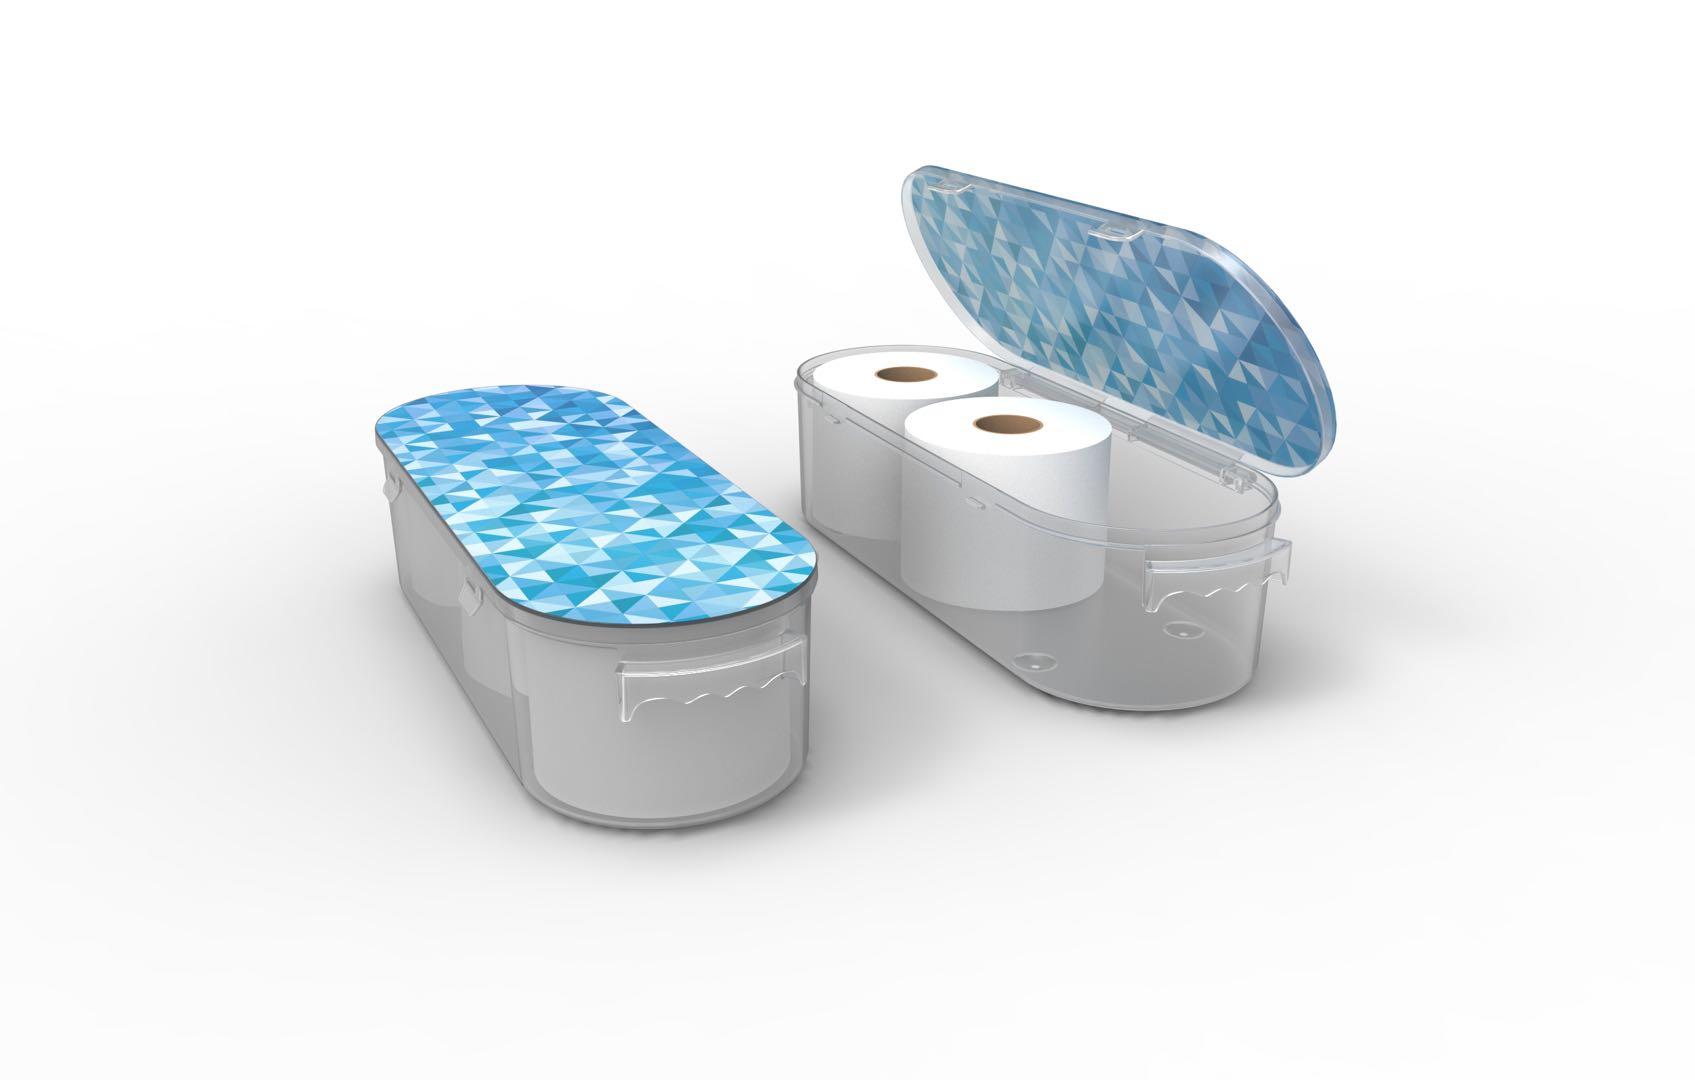 Nykia Designs Bathroom Toilet Paper Storage Solution - Blue Mosaic